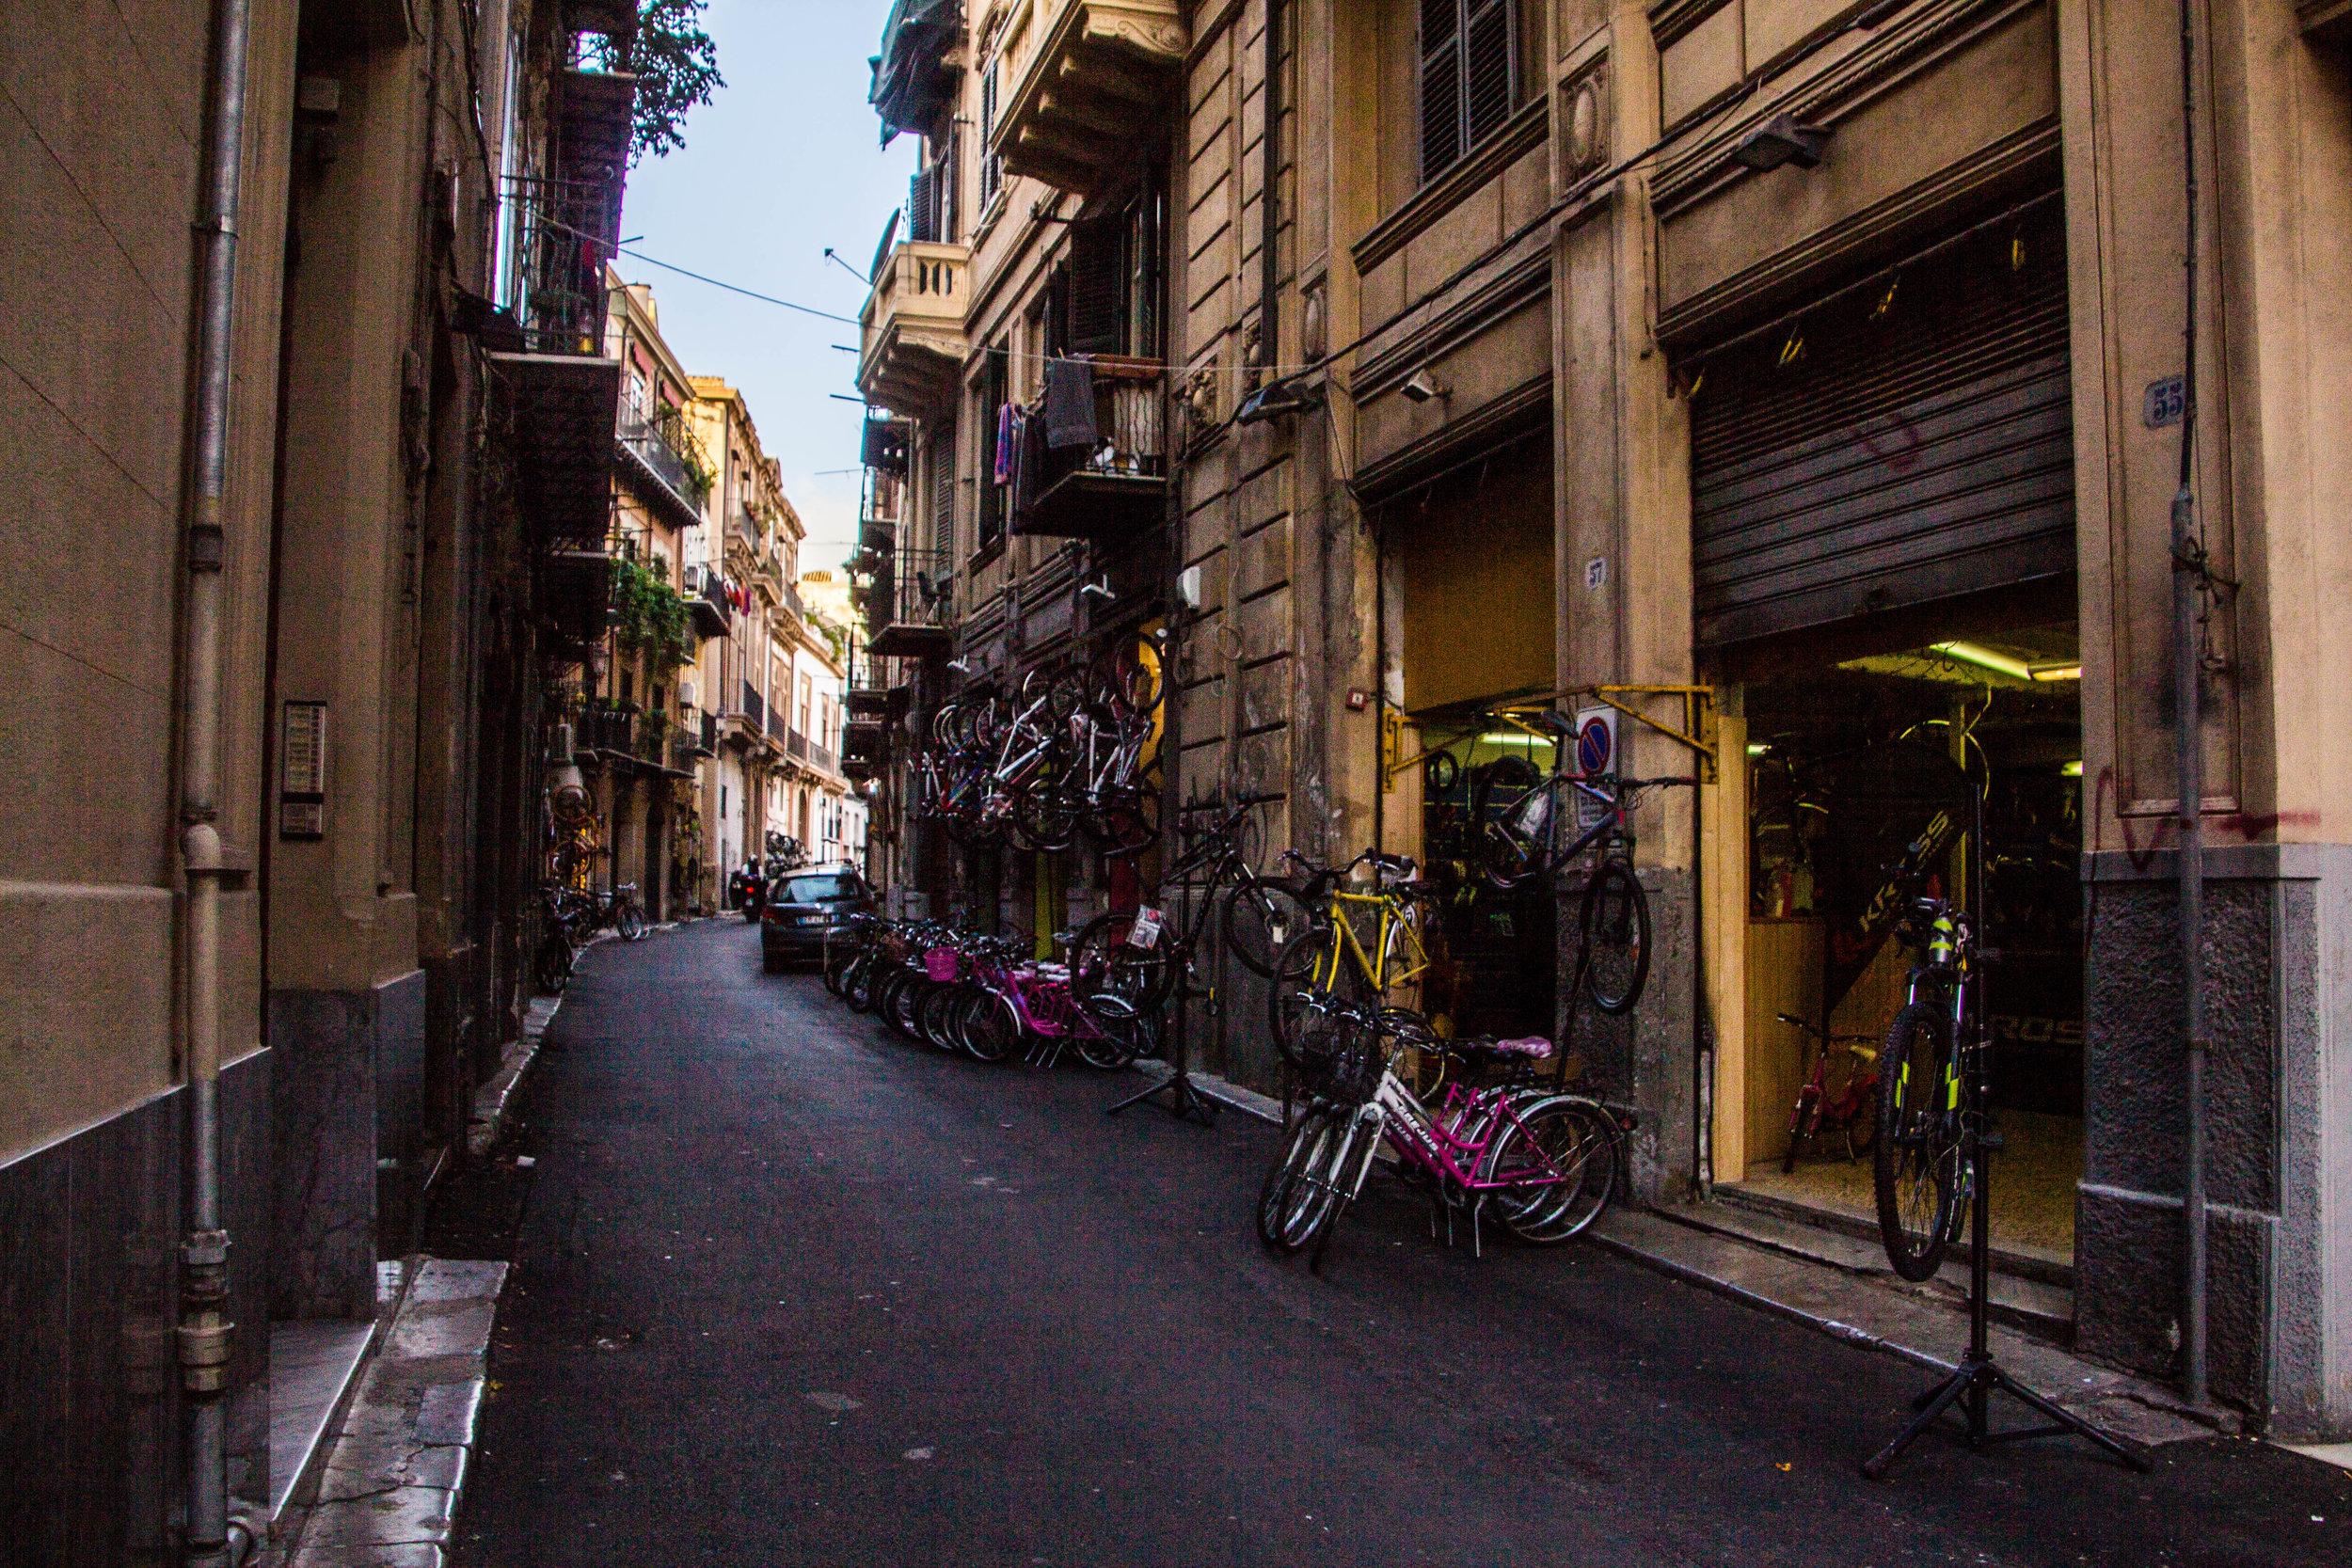 street-photography-palermo-sicily-1.jpg